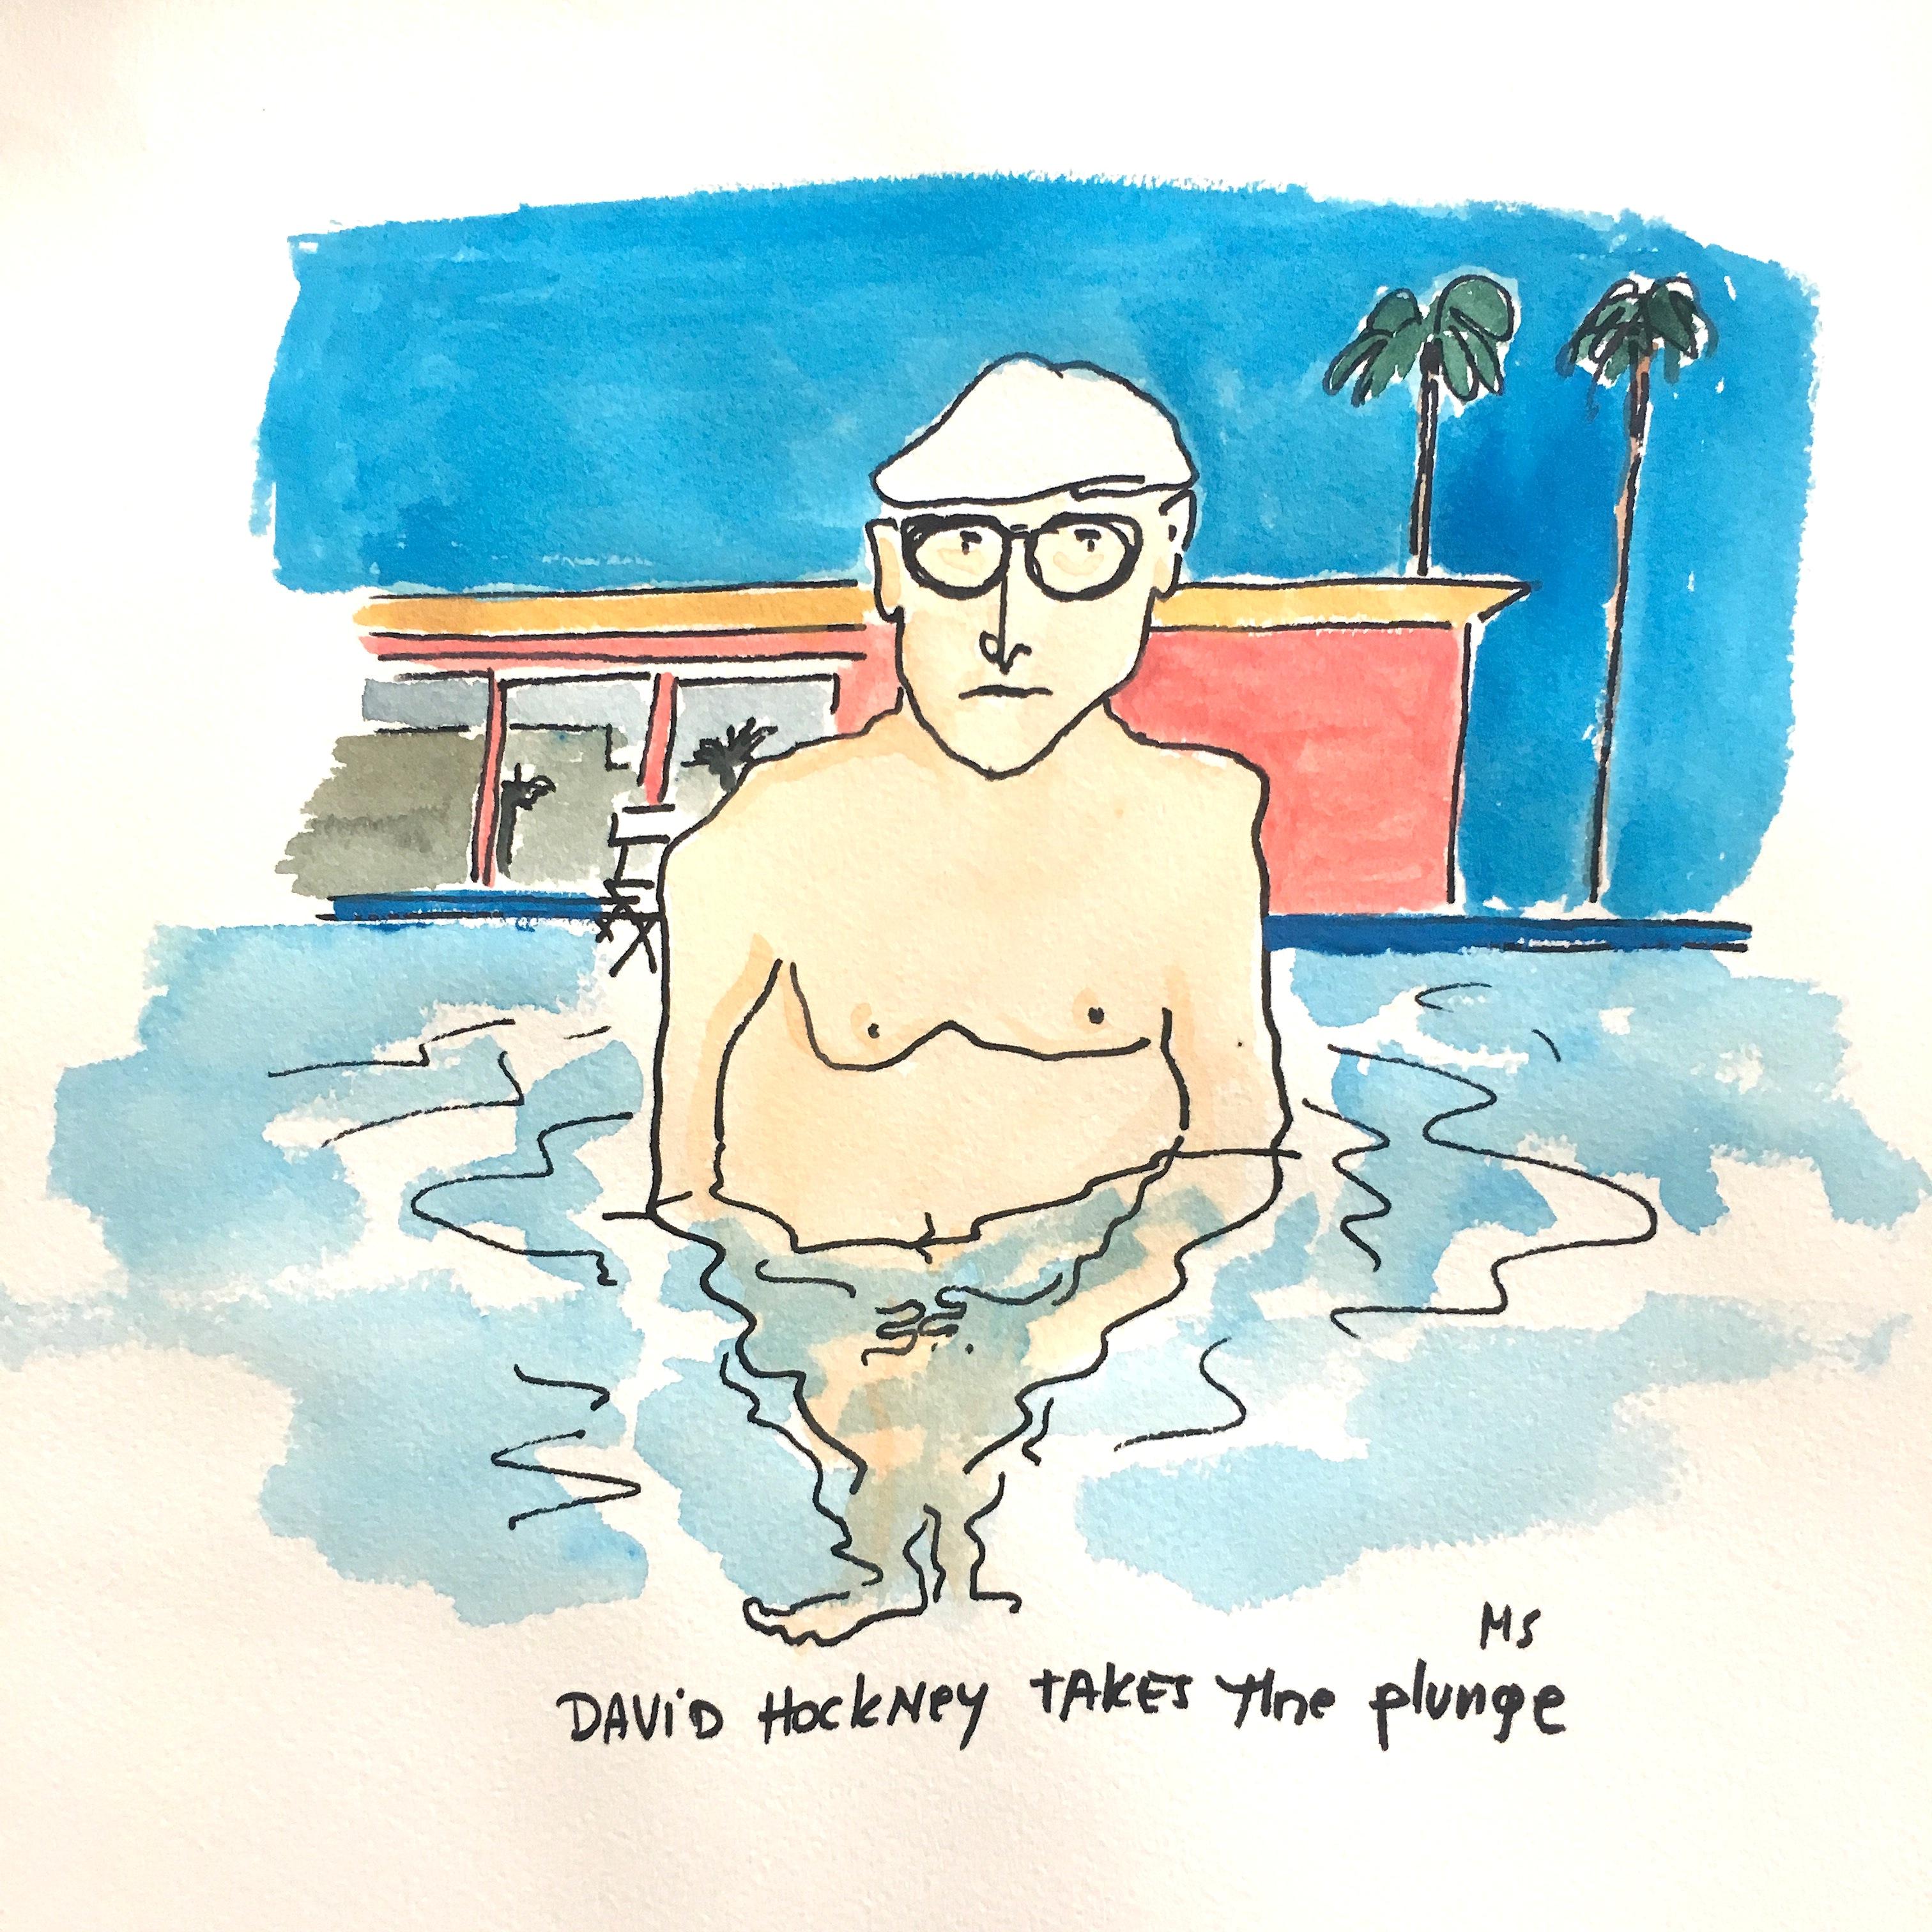 David Hockney Takes the Plunge